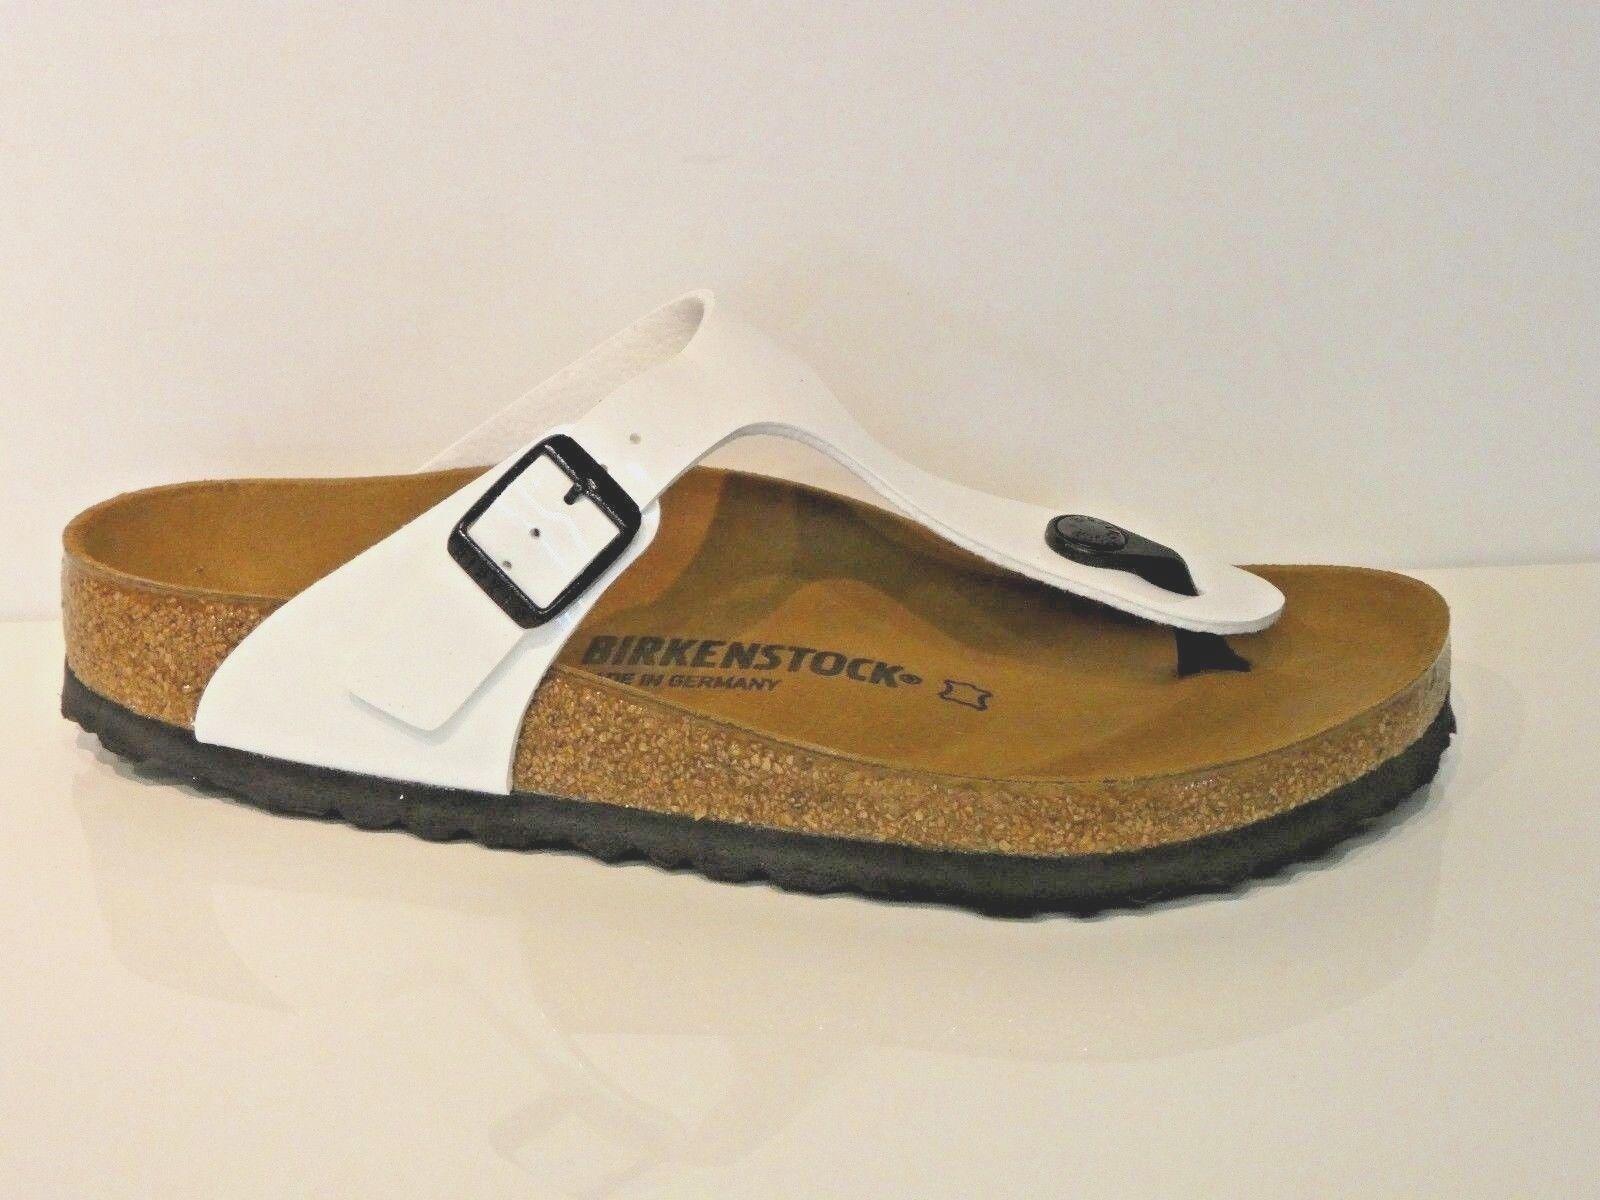 Birkenstock Schuhe Gizeh BS Pantoletten Sandale patent WEISS weiß Lack Normal